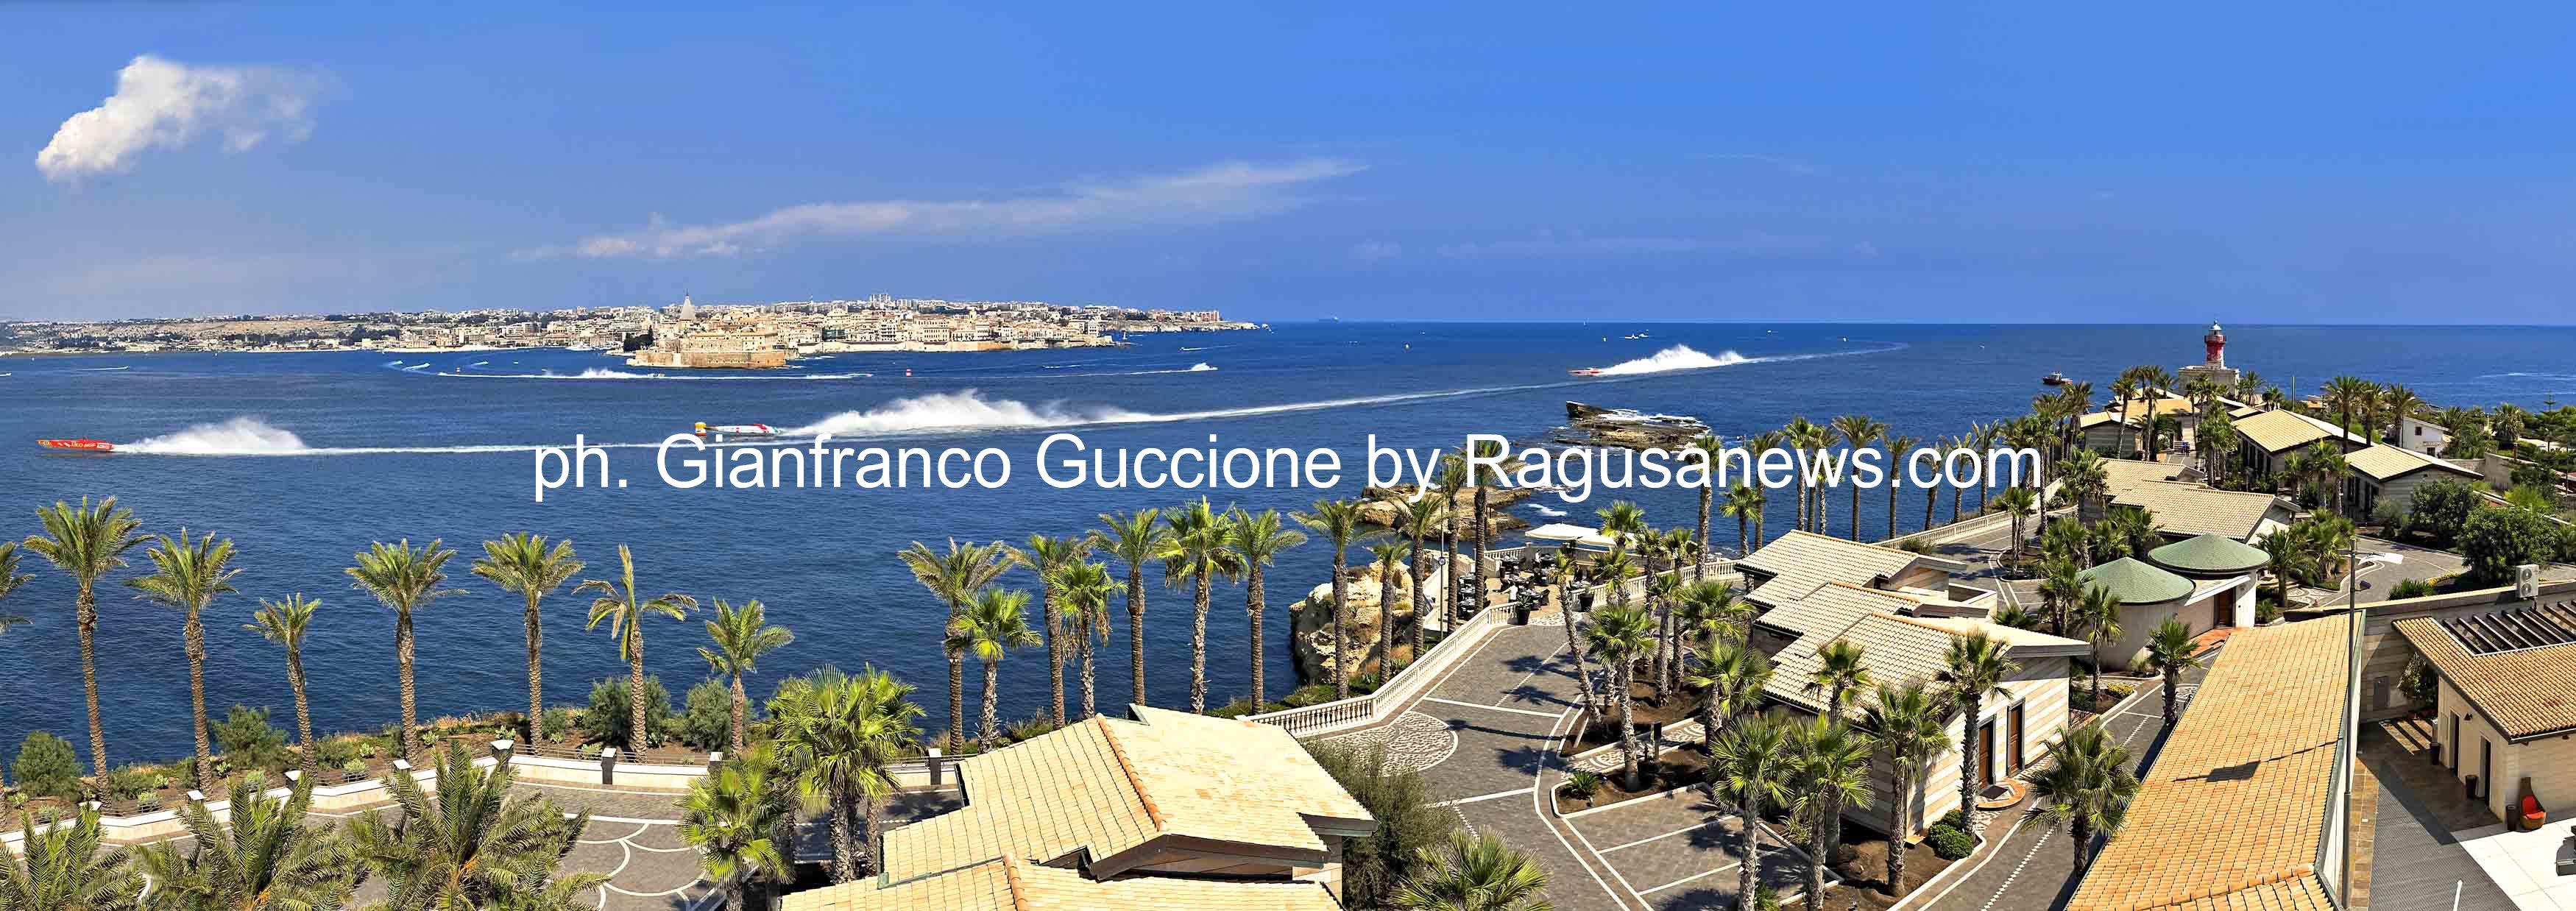 https://www.ragusanews.com//immagini_articoli/29-06-2014/1404076139-3-sicily-photos-su-ragusanews.jpg